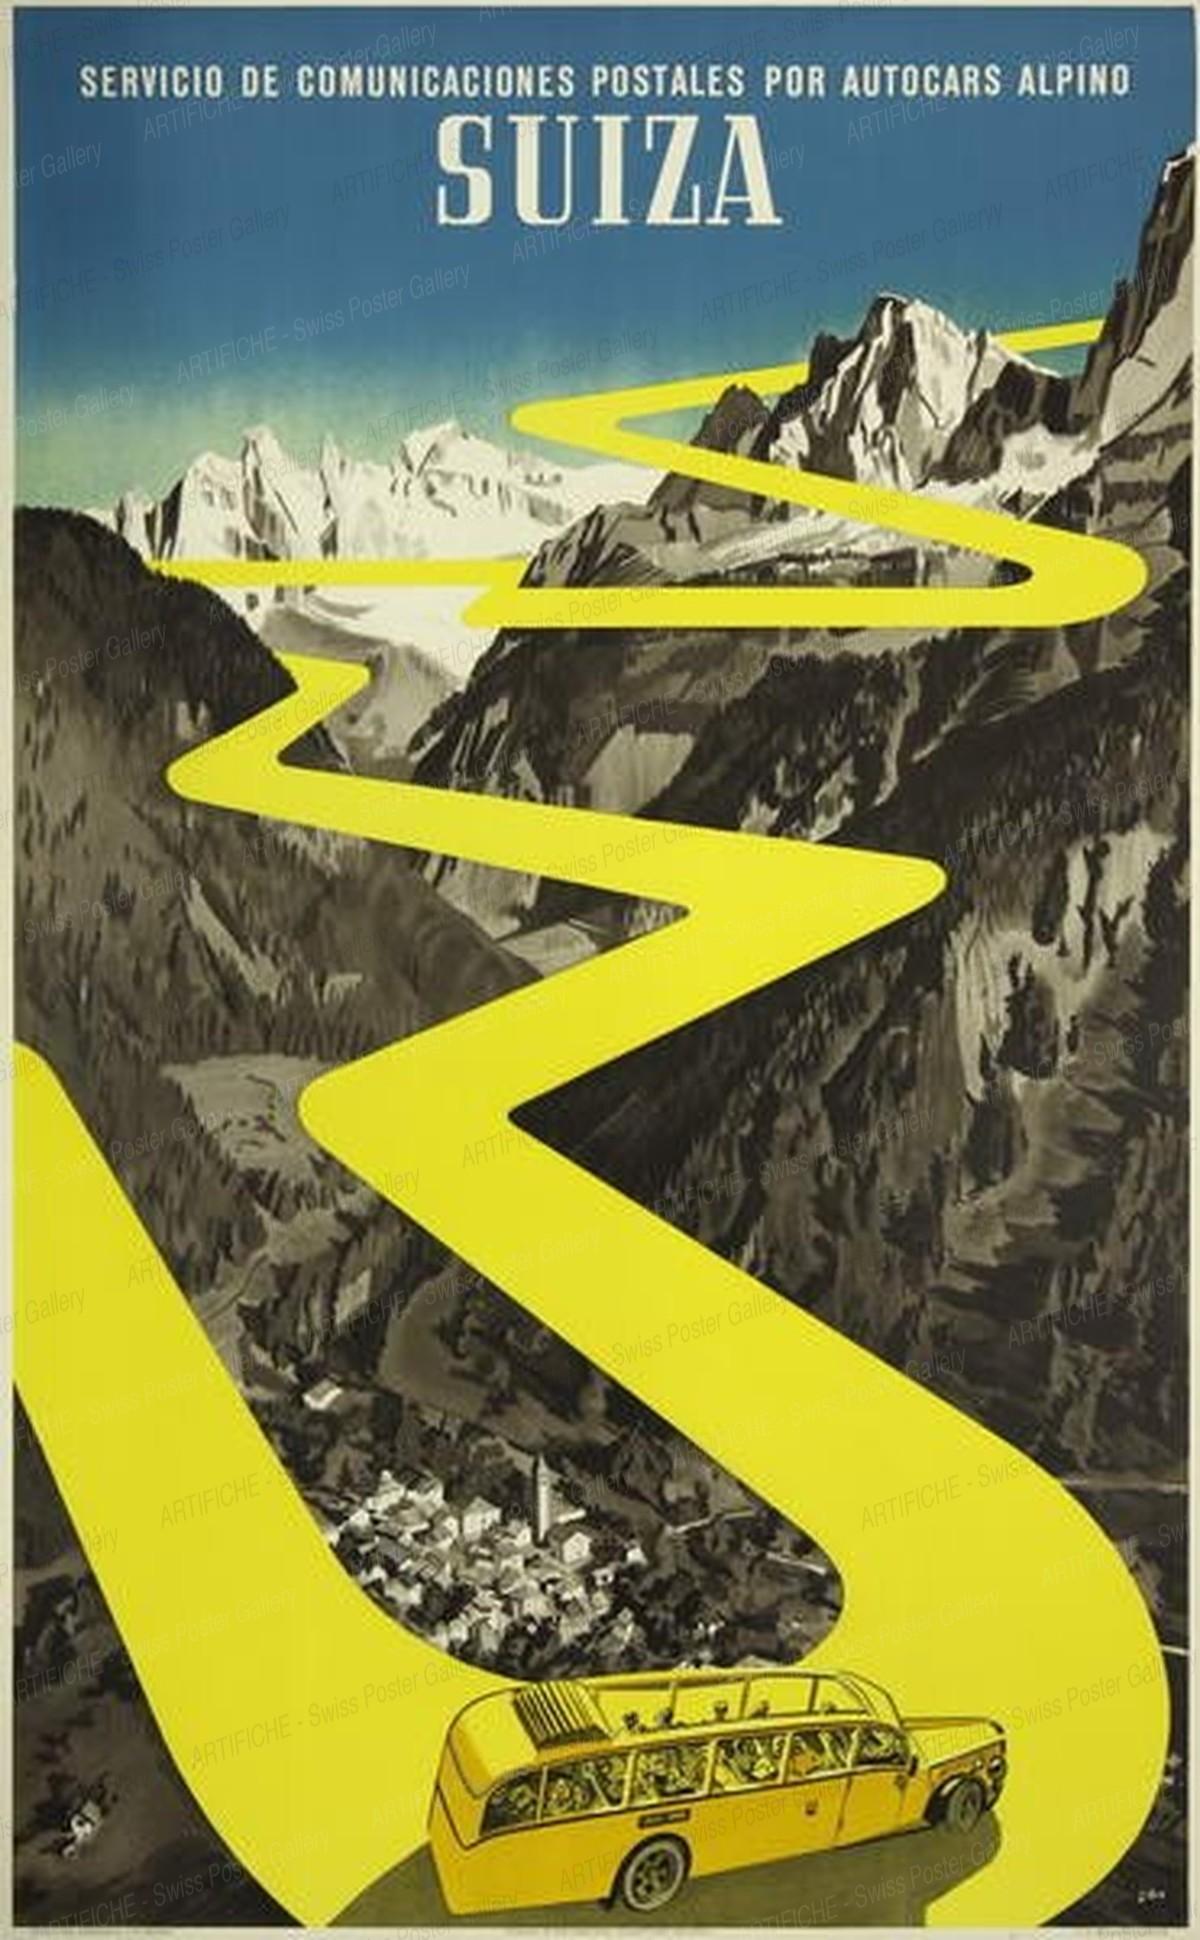 Suiza – Servicio de comunicaciones postales por autocars alpino, Herbert Berthold Libiszewski